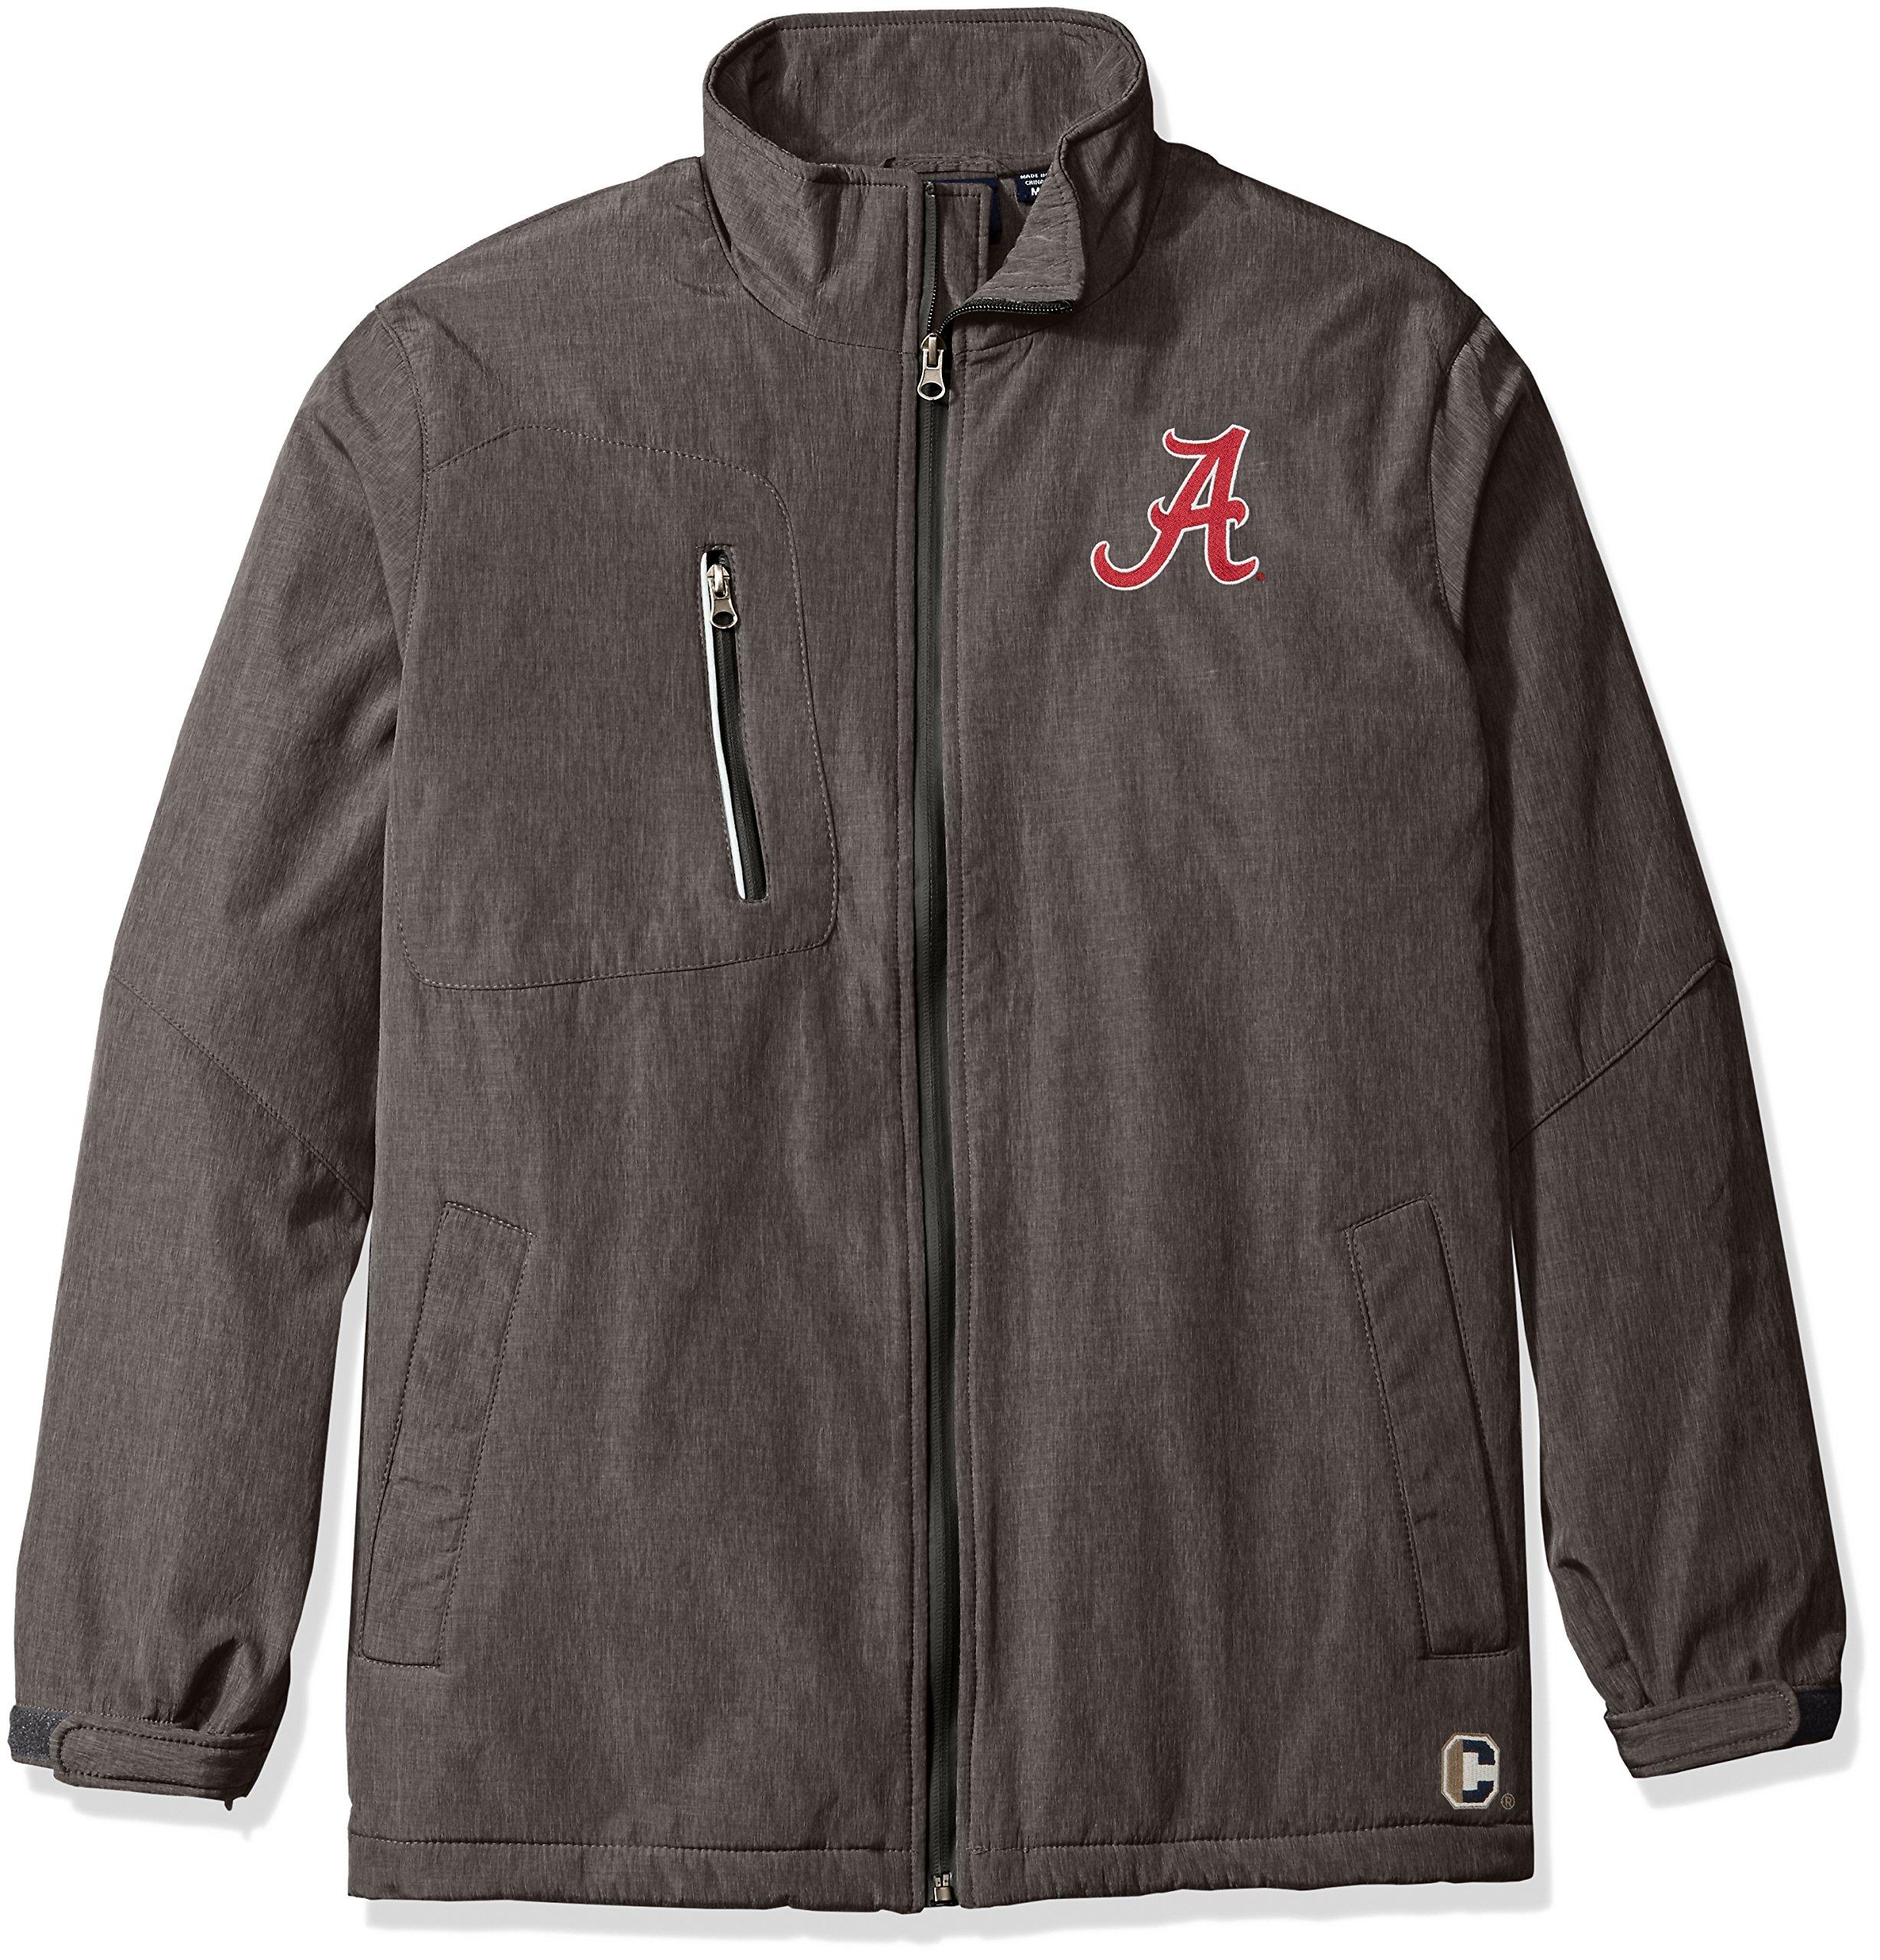 NCAA Alabama Crimson Tide Men's Bonded Stand Up Collar Stadium Jacket, Large, Dark Gray